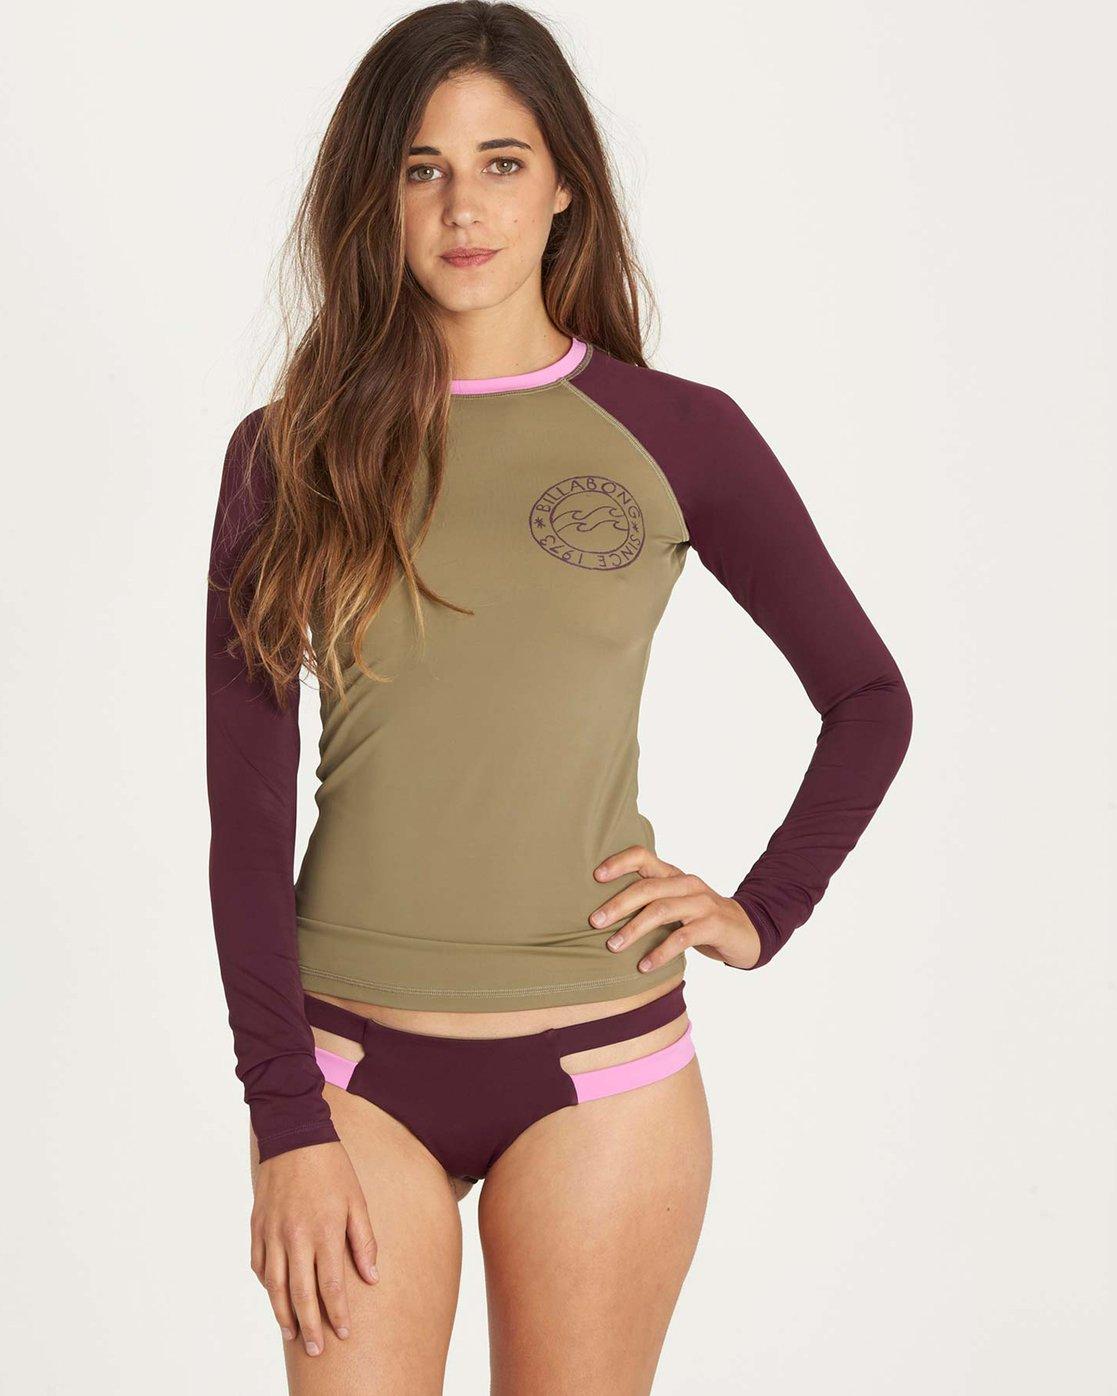 Billabong Womens Surf Capsule Long Sleeve Rashguard